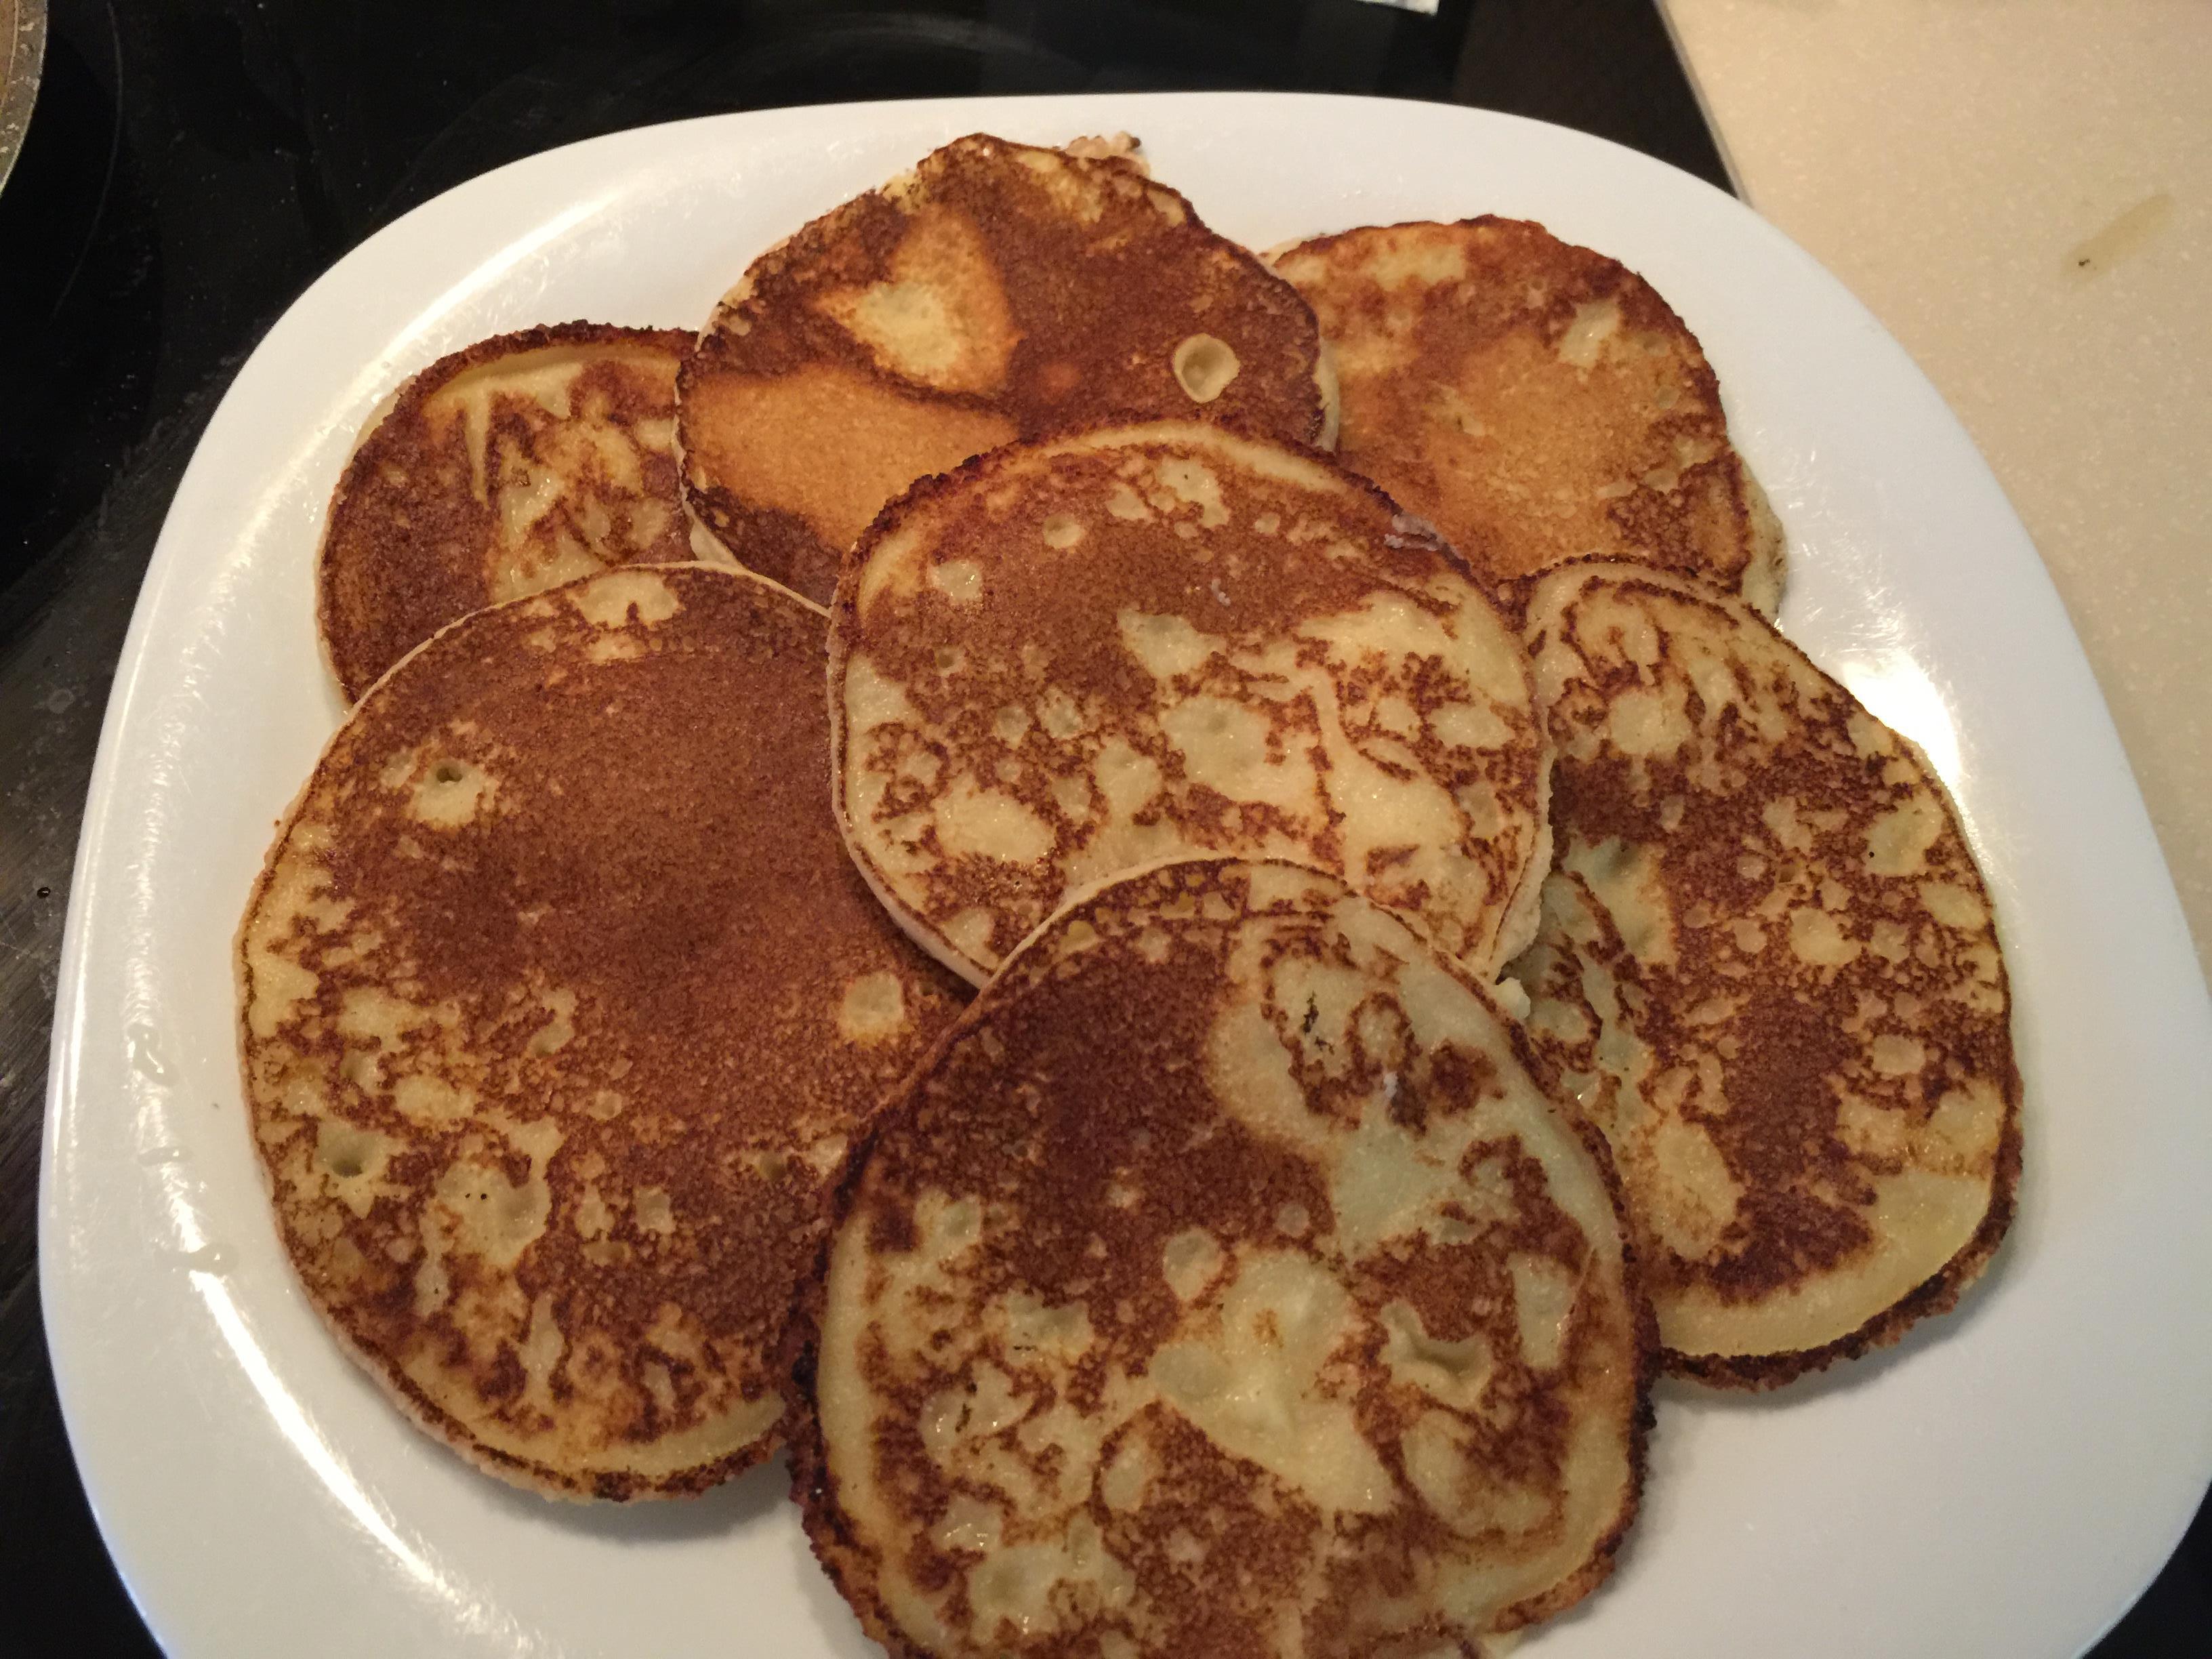 Tapiokine palačinke brez glutena